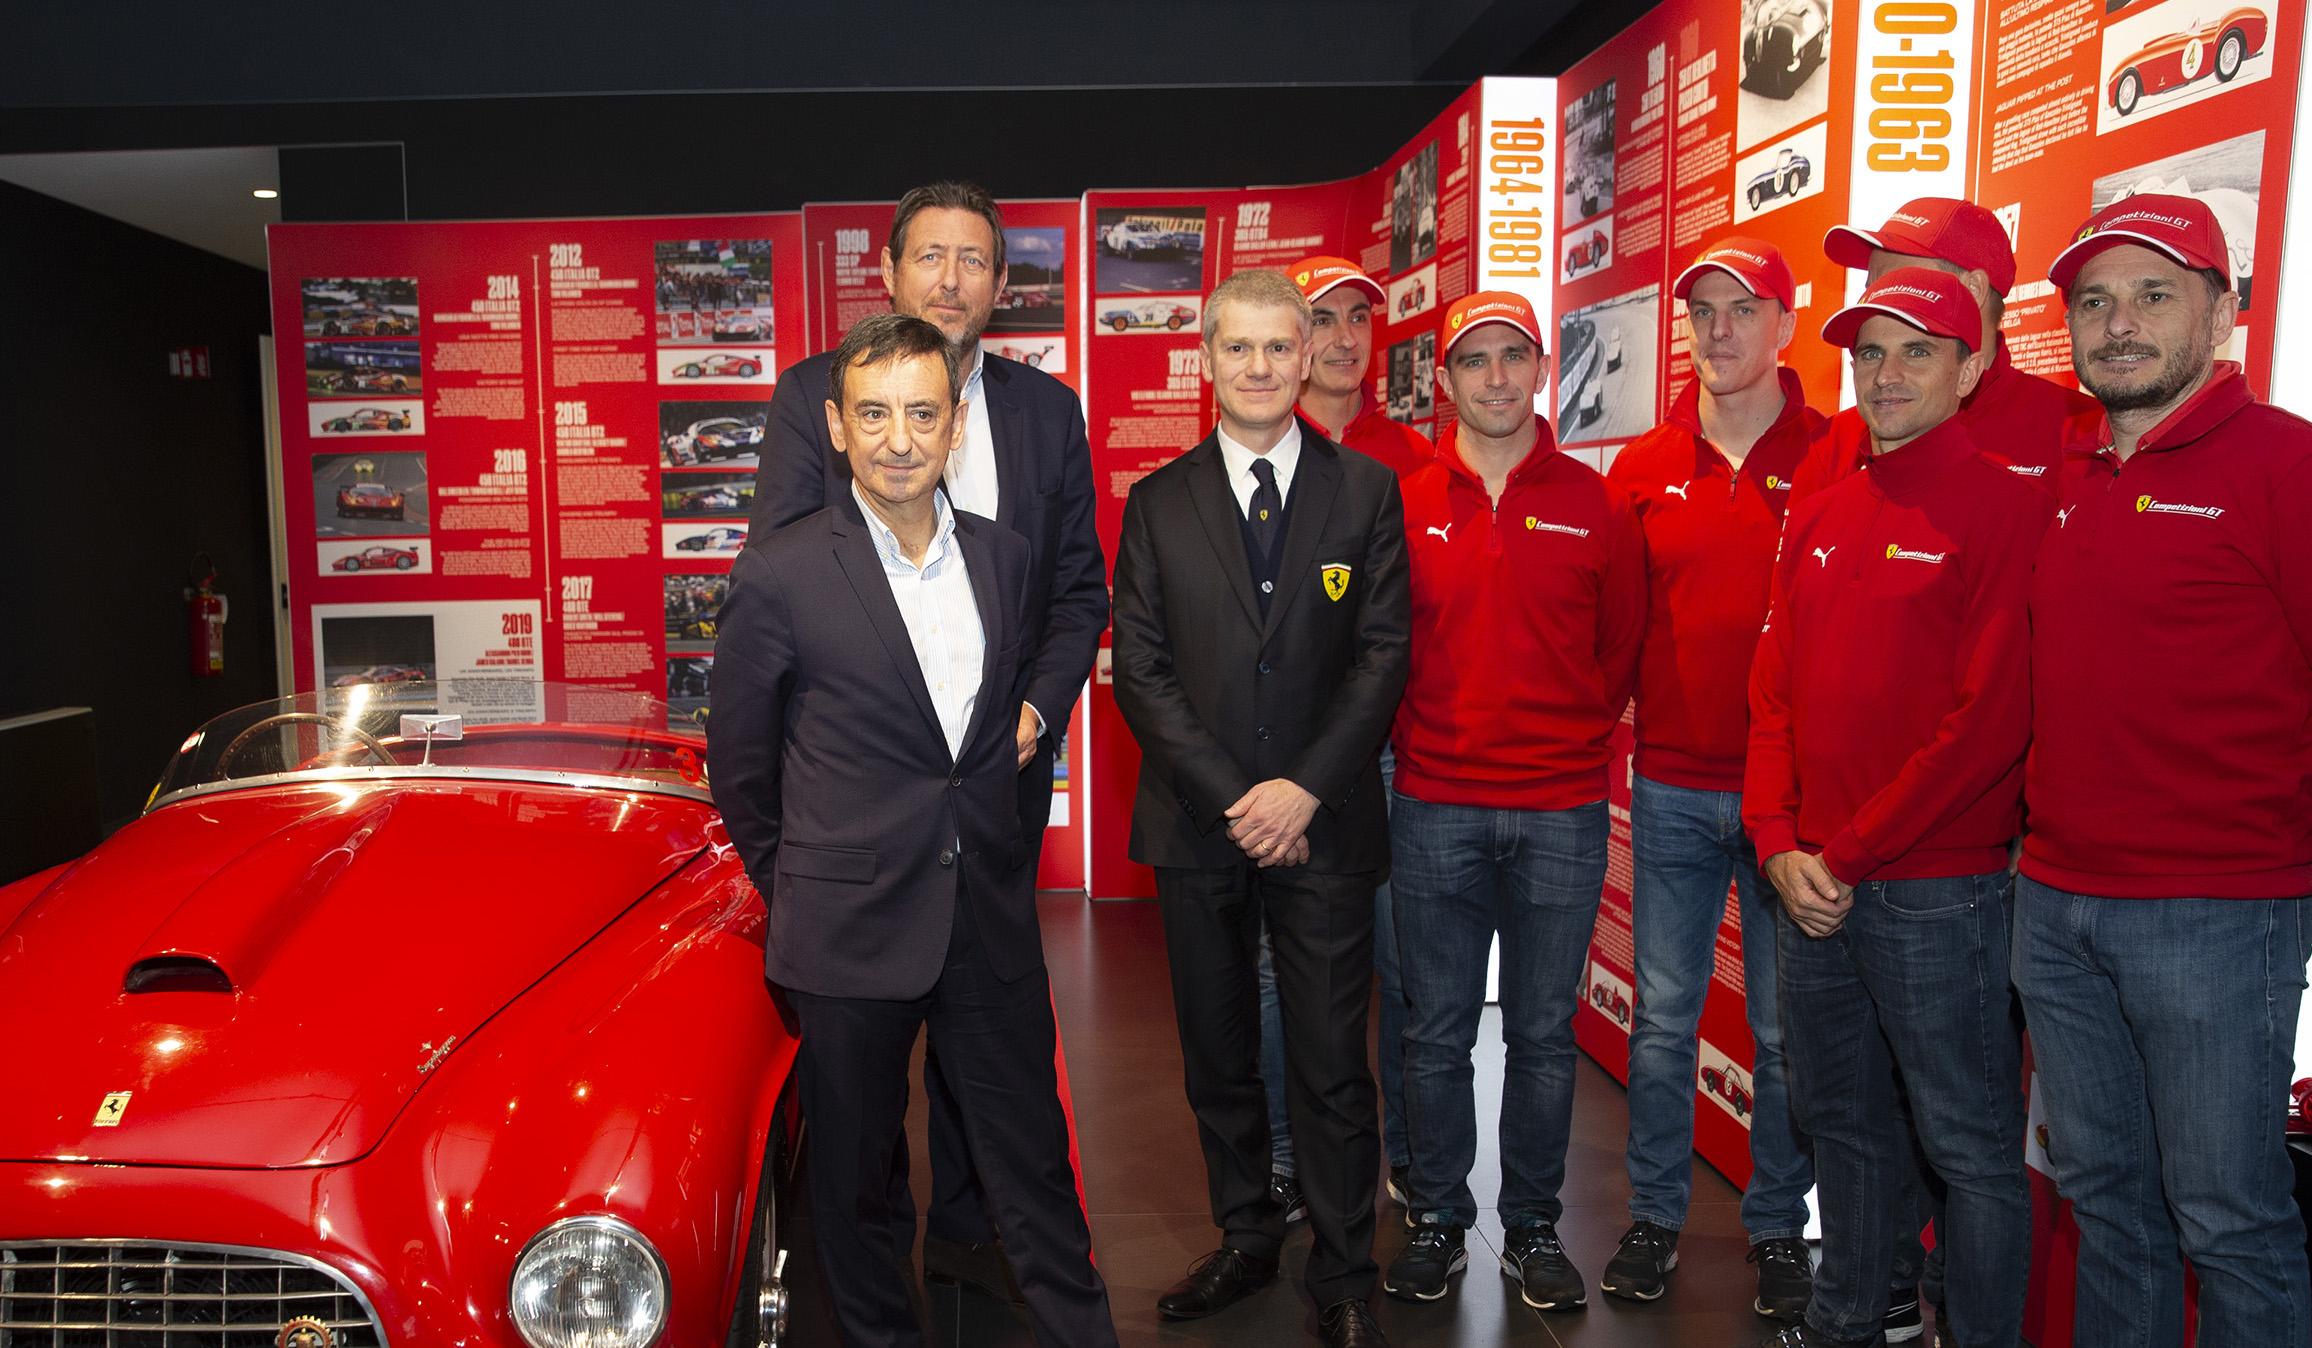 Ferrari celebrates its rich history with Le Mans - FIA World Endurance